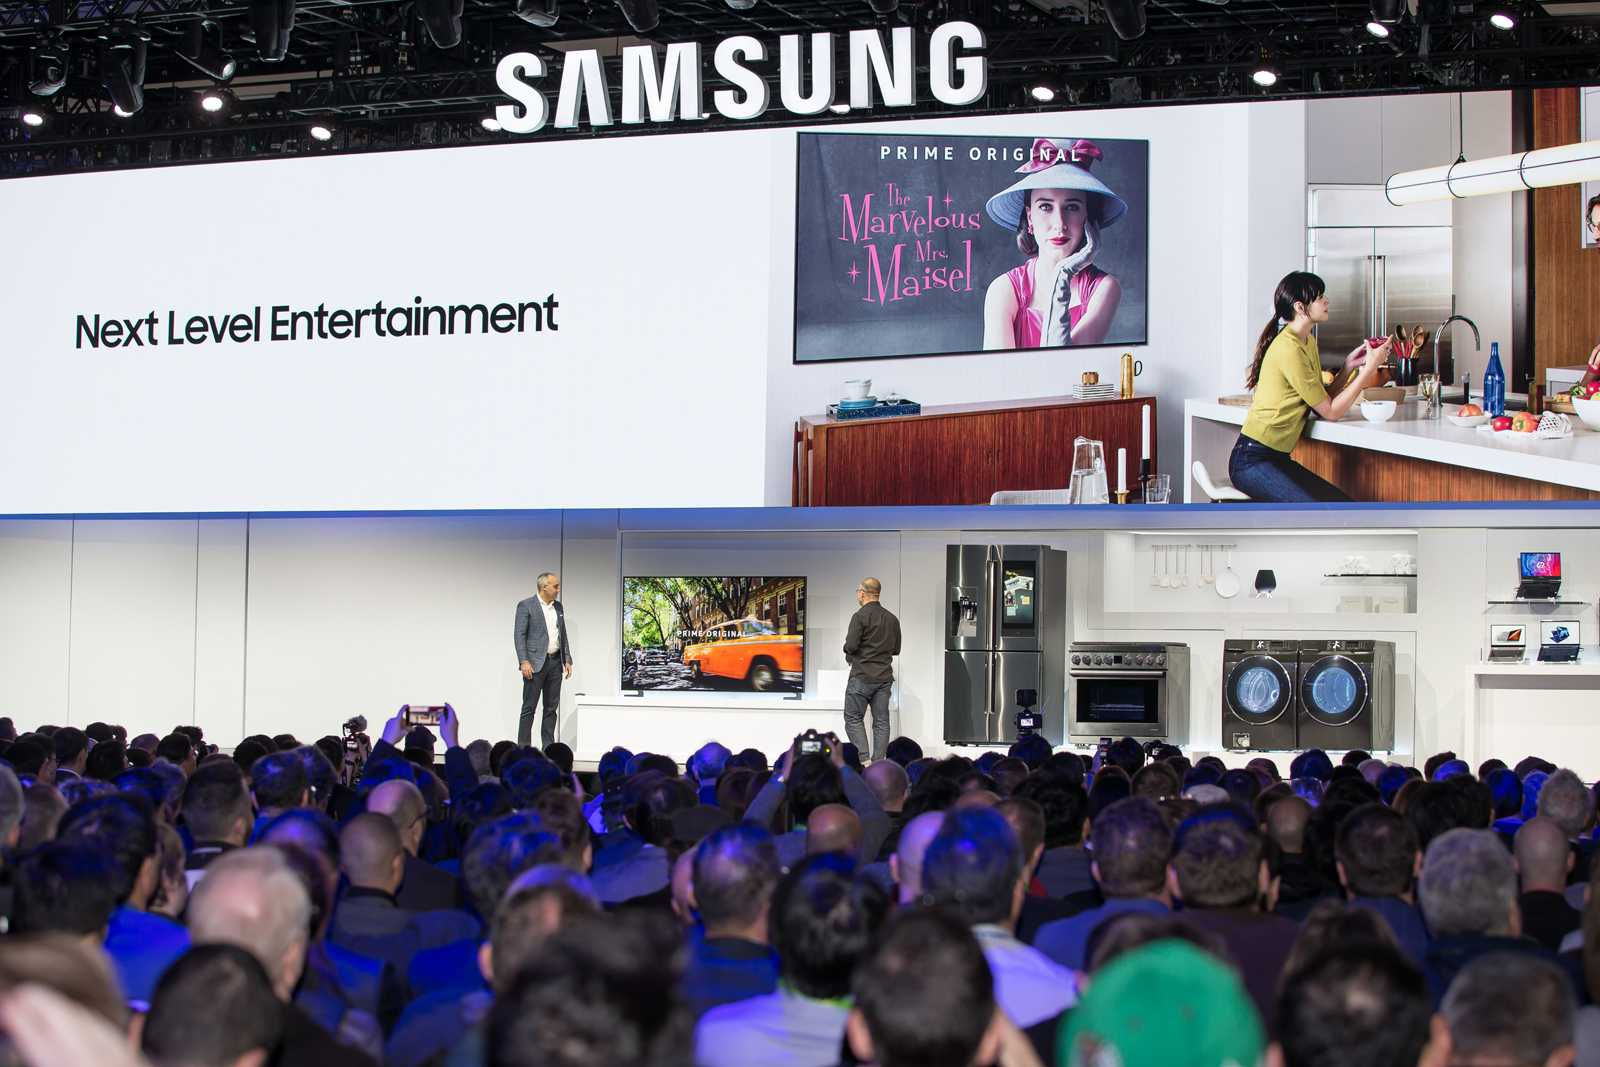 8c6752d646ab Η Samsung παρουσίασε στη CES 2019 το μέλλον ενός Δικτυωμένου Τρόπου Ζωής